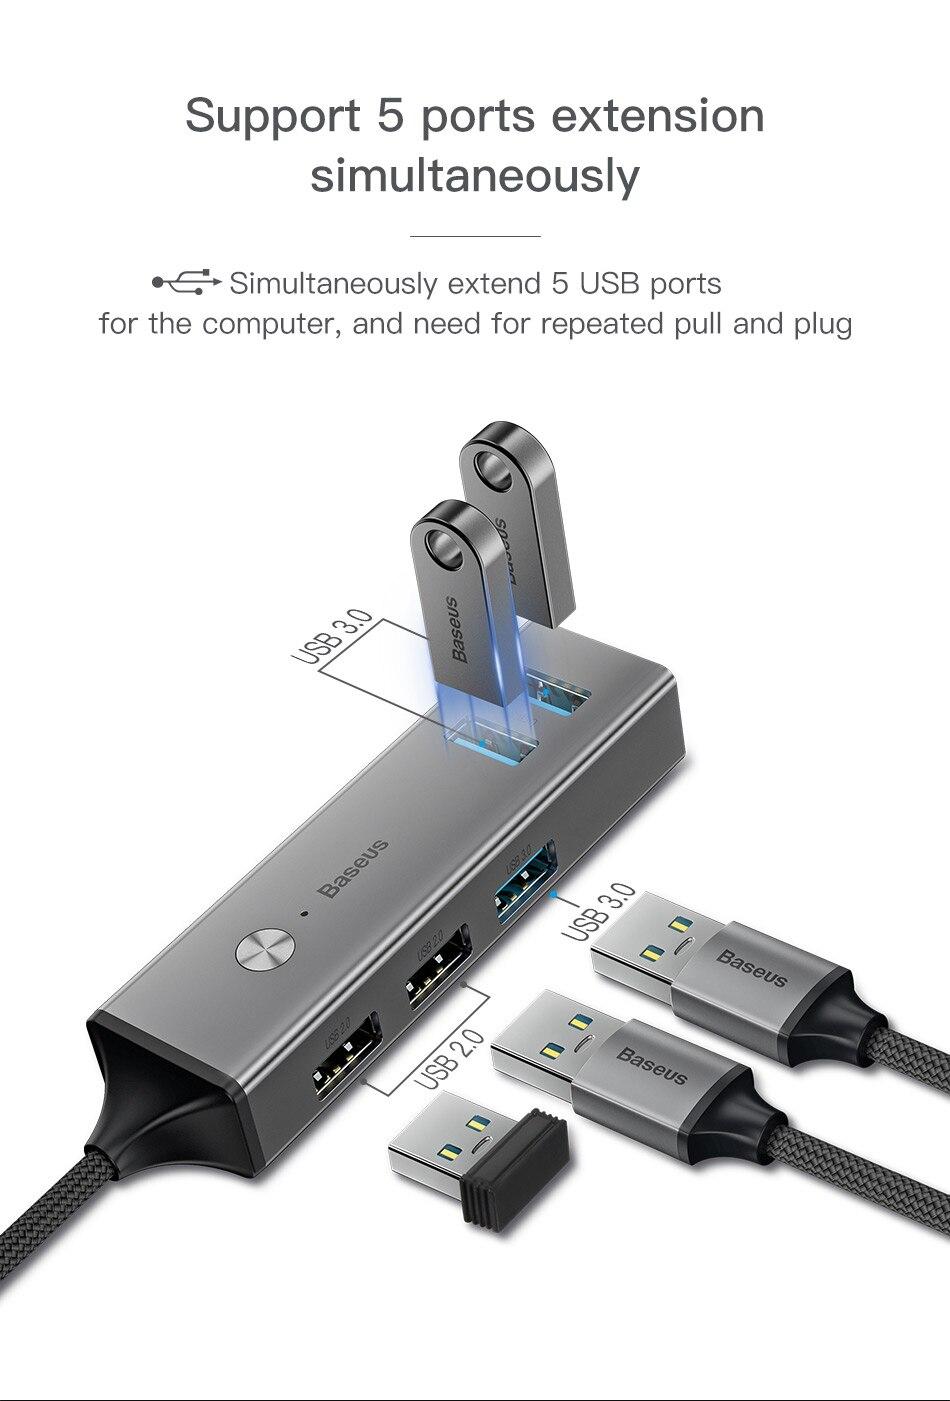 Baseus 5 Ports USB C HUB to USB 3.0 OTG USB HUB Splitter High Speed 5Gbps For Macbook Computer Laptop Type C HUB USB 2.0 Adapter 2